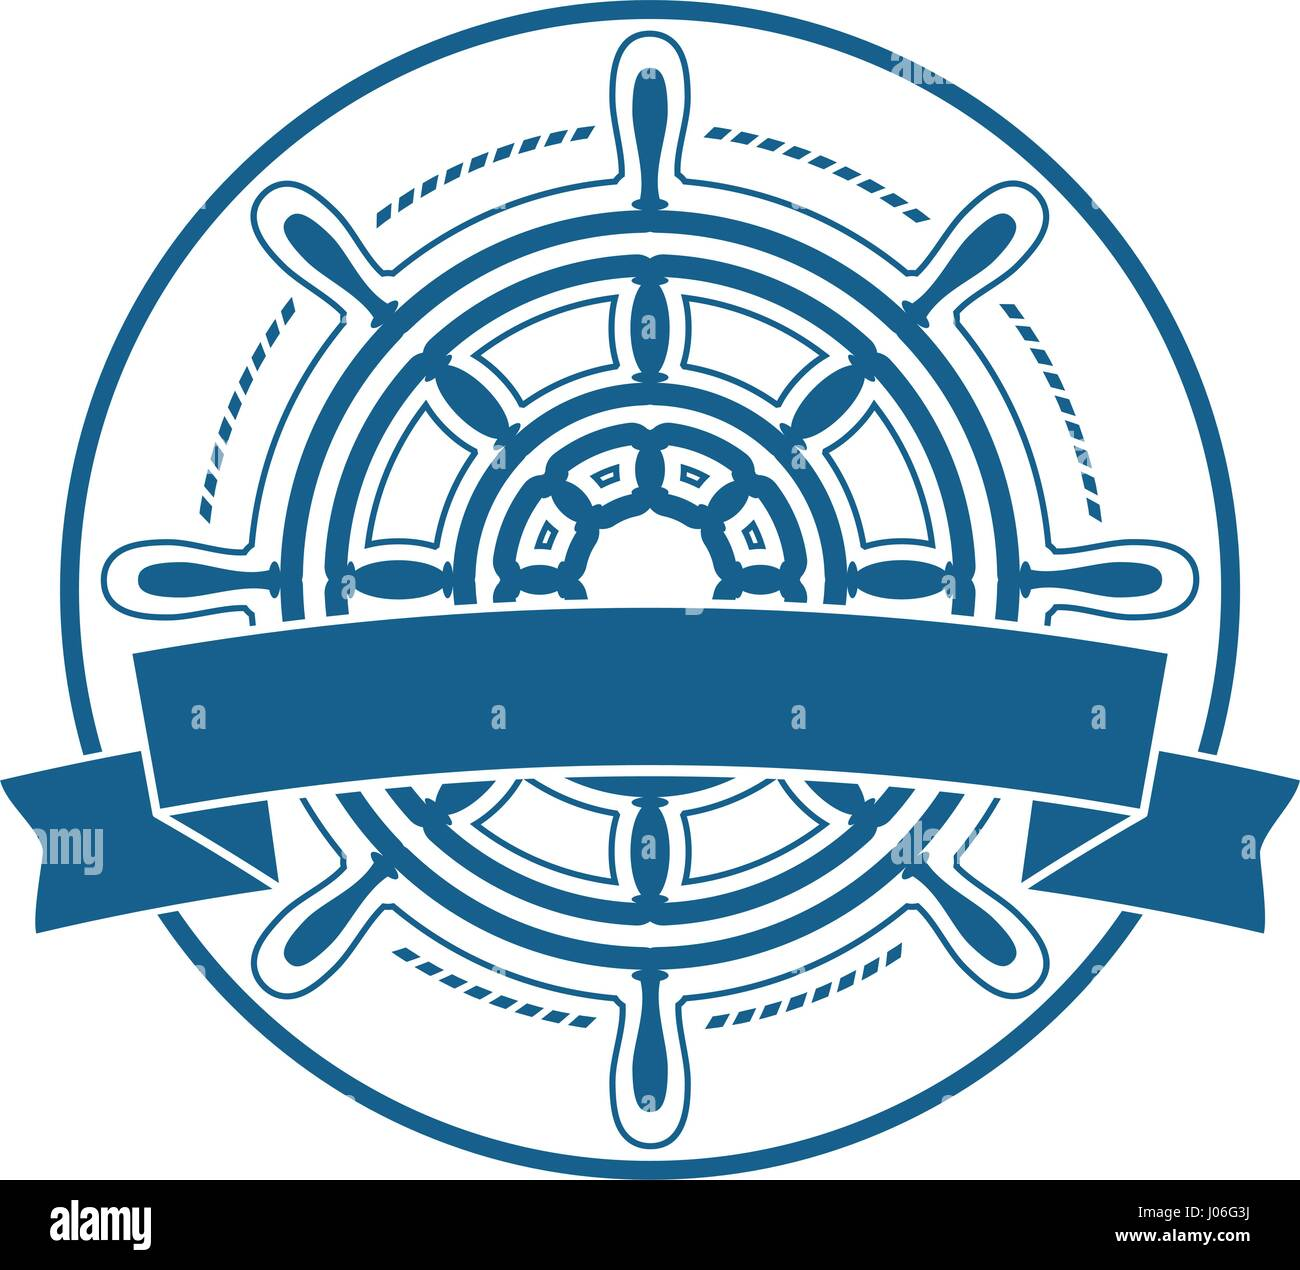 0e78924f7 Ship steering wheel emblem with banner Stock Vector Art ...